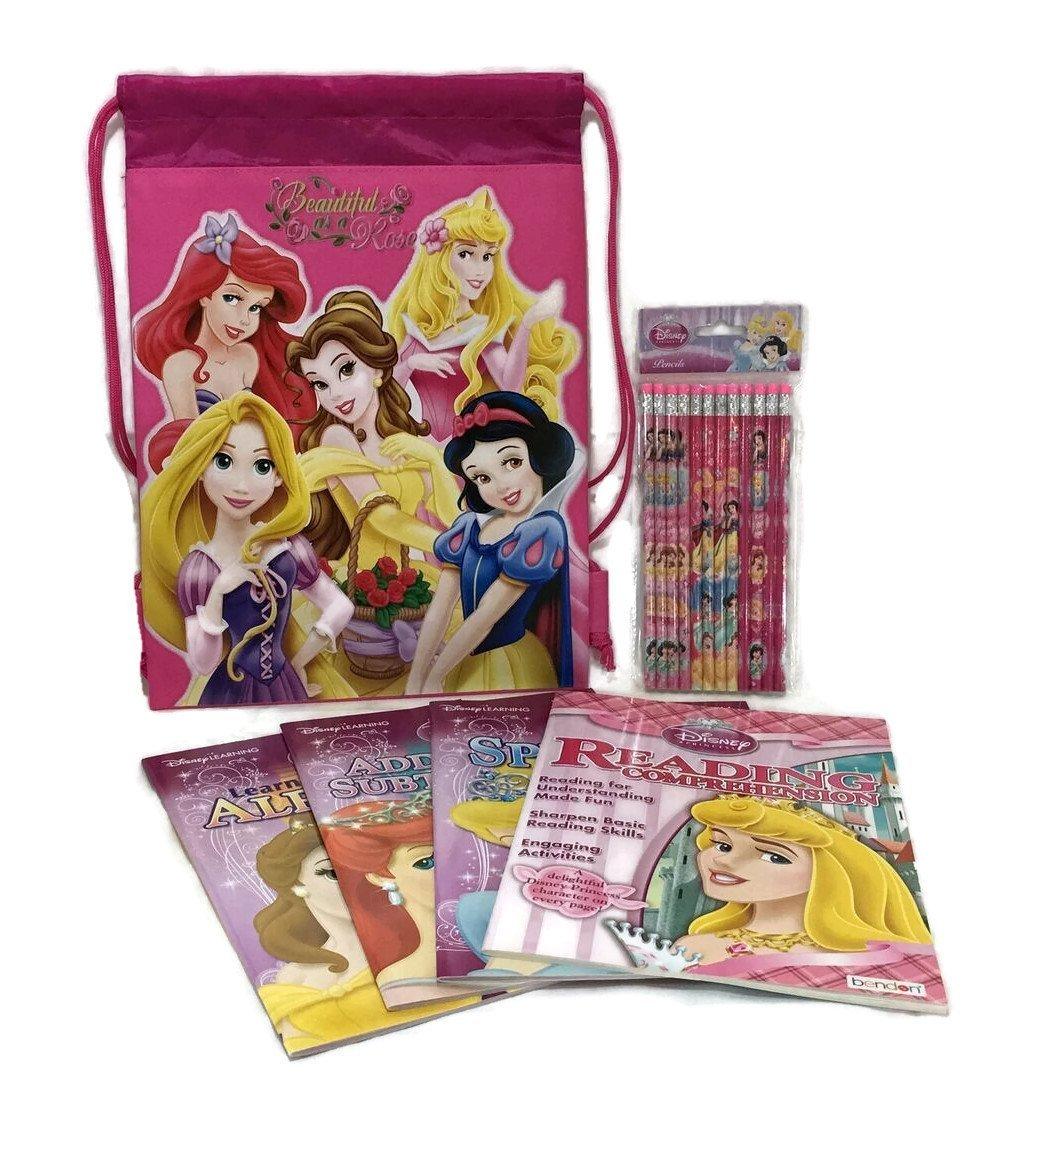 Princess Learning Workbook & School Supply Bundle: 6 Items- Four Princess Themed Workbooks, One Pack of A Dozen Princess Pencils, Plus One Princess Drawstring Carrying Bag